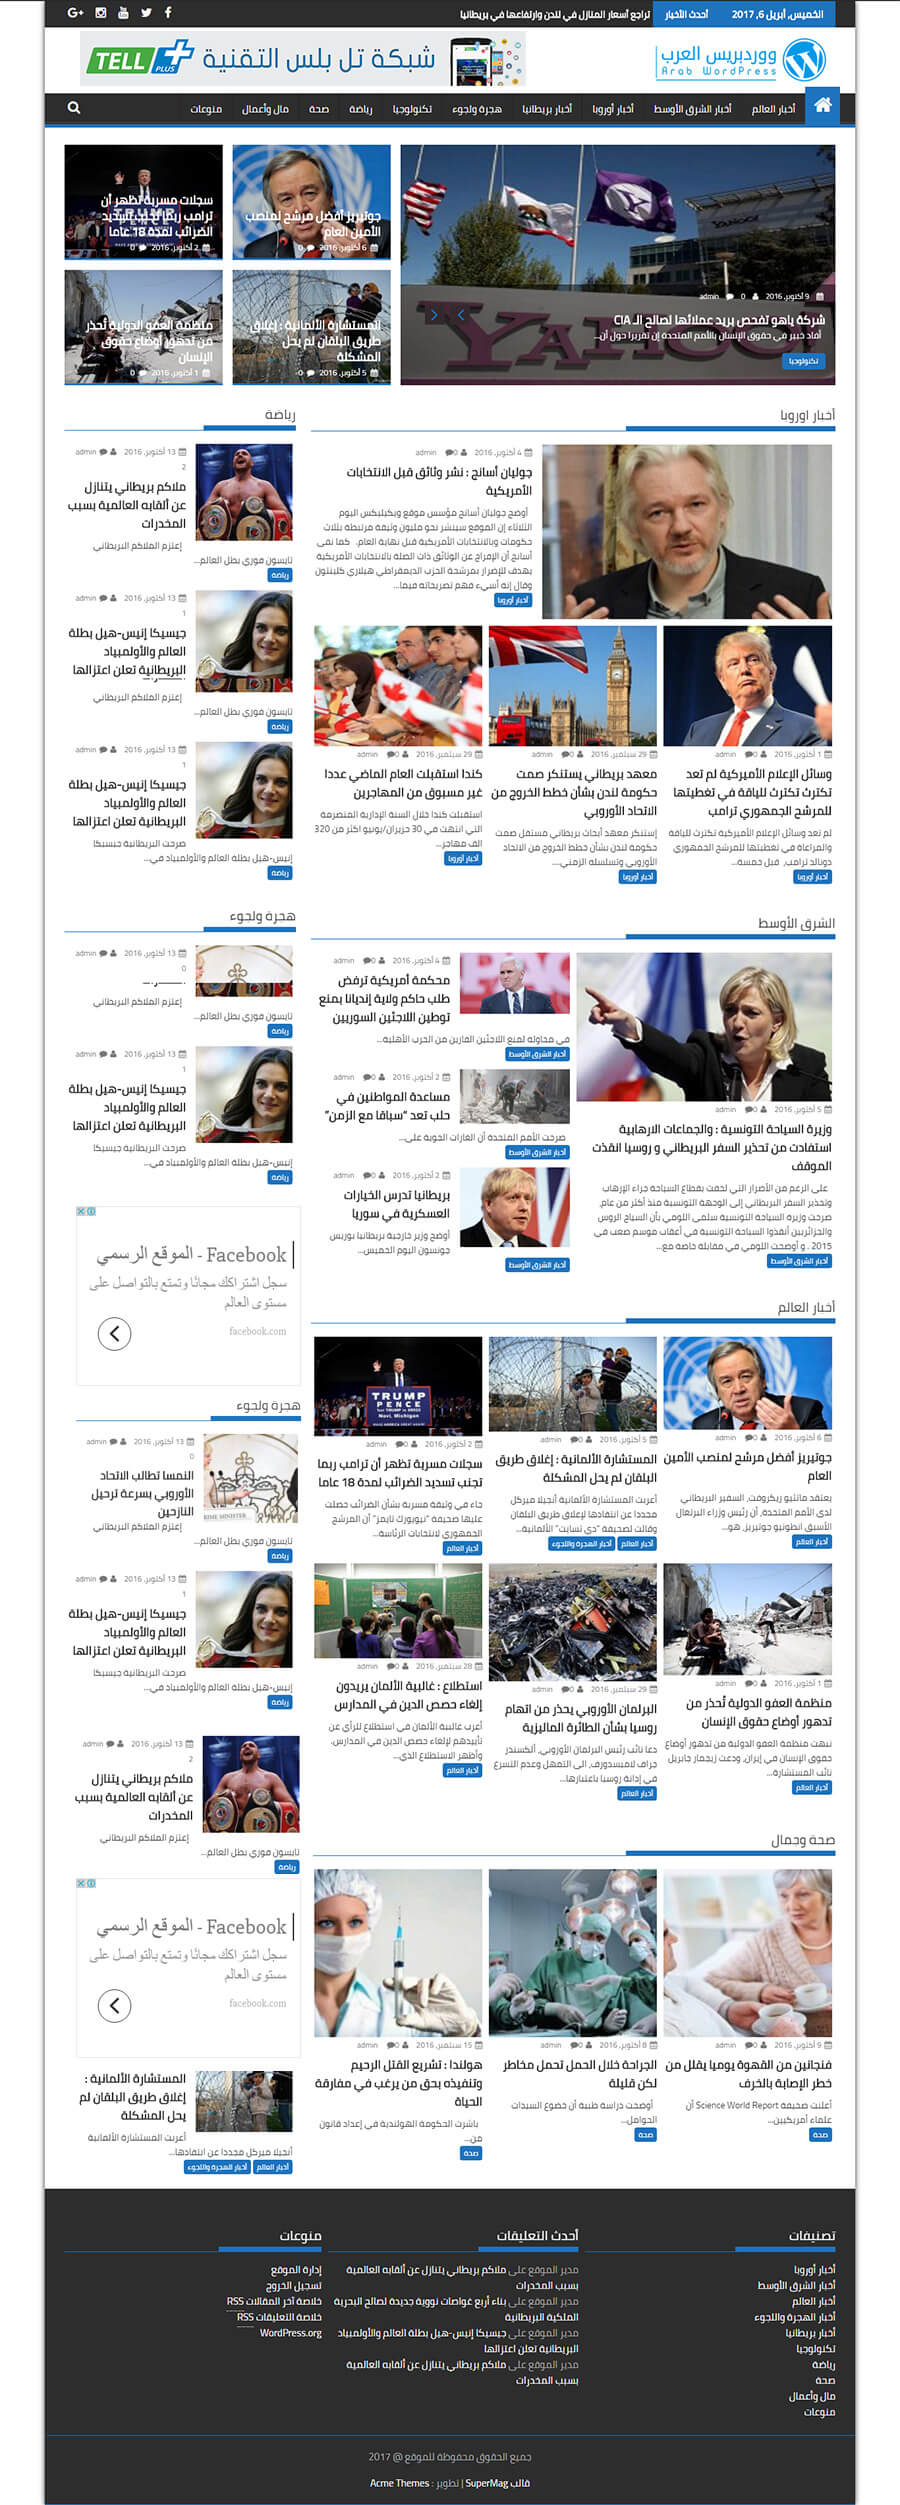 SuperMag الإخباري بالنسخة العربية الكاملة ووردبريس العرب